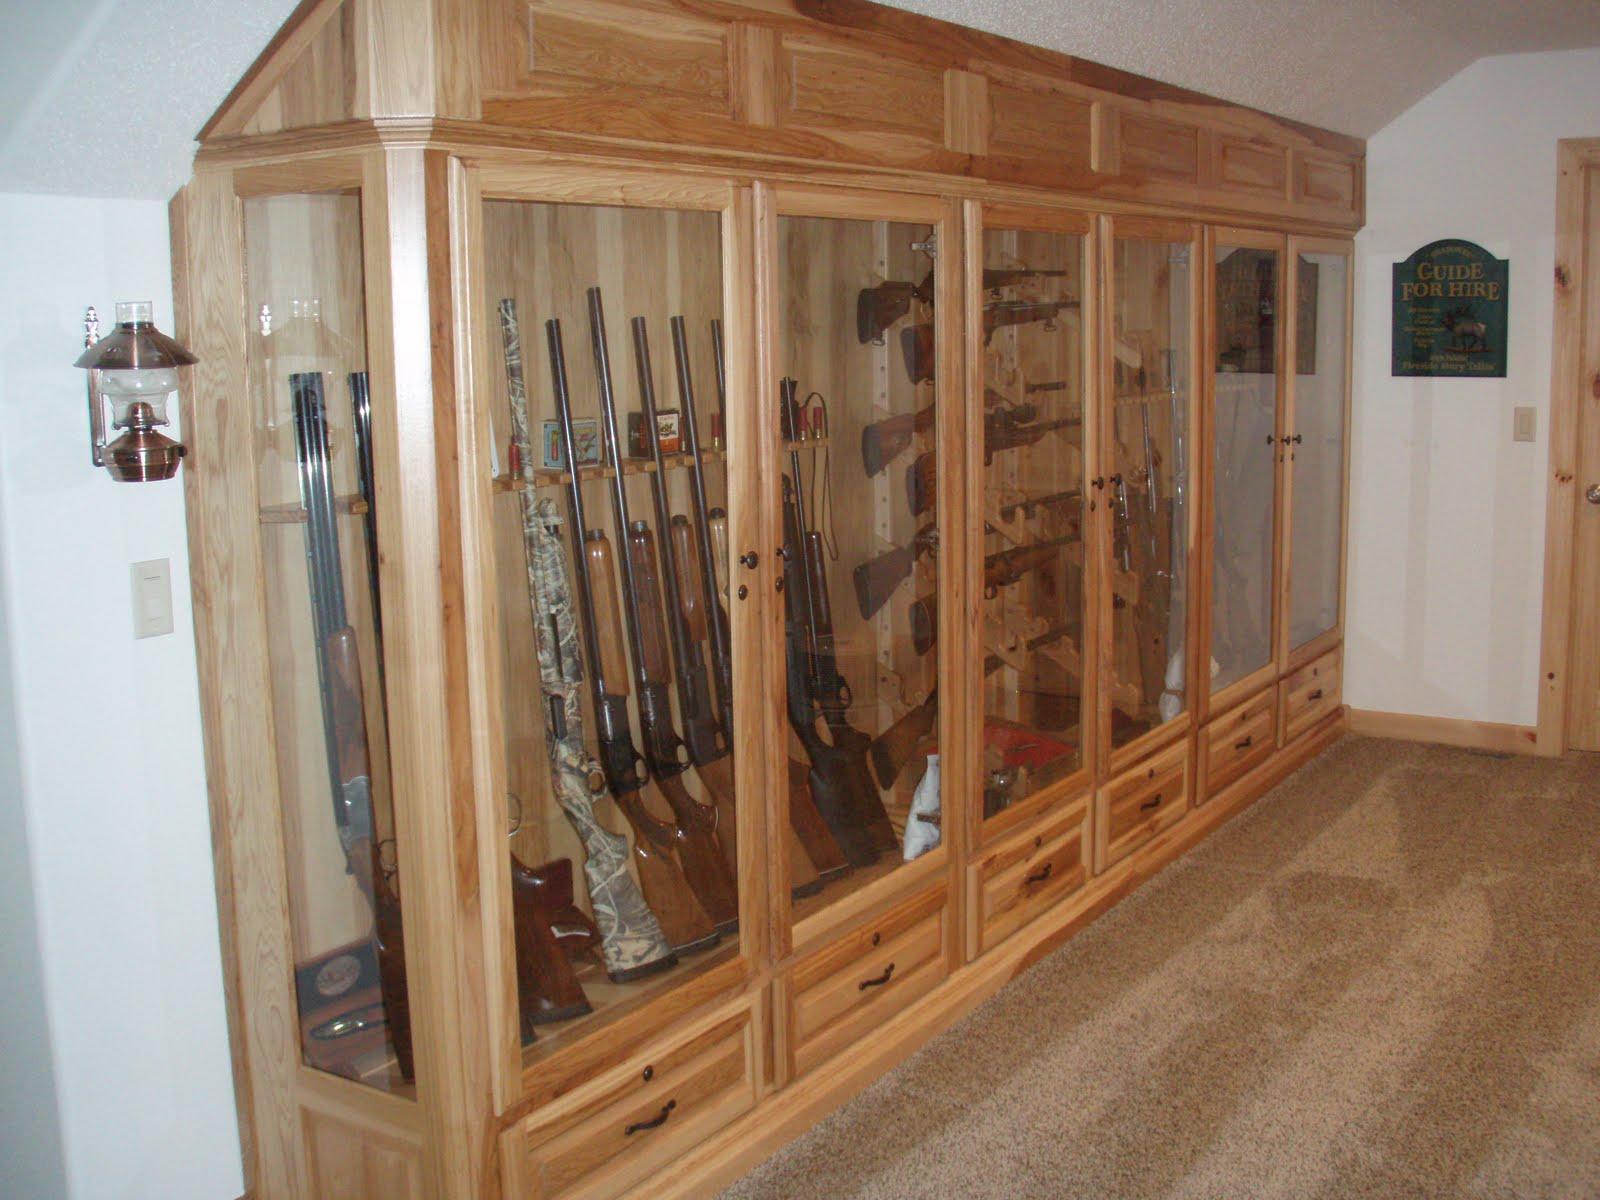 Original  Patterns Klingspor Woodworking Hickory Nc Amish Solid Wood Furniture